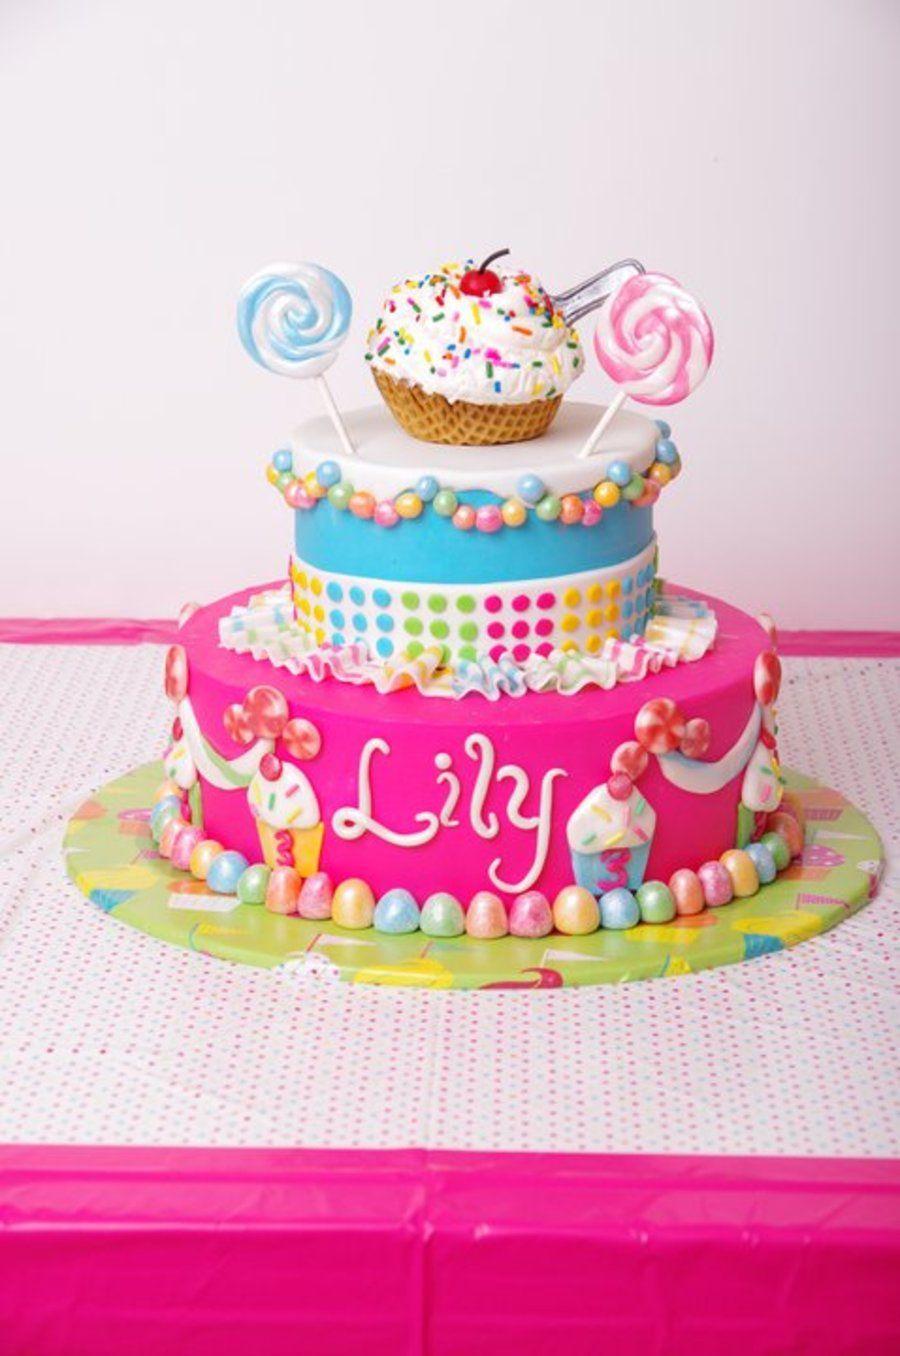 Sweet Shoppe Cake on Cake Central